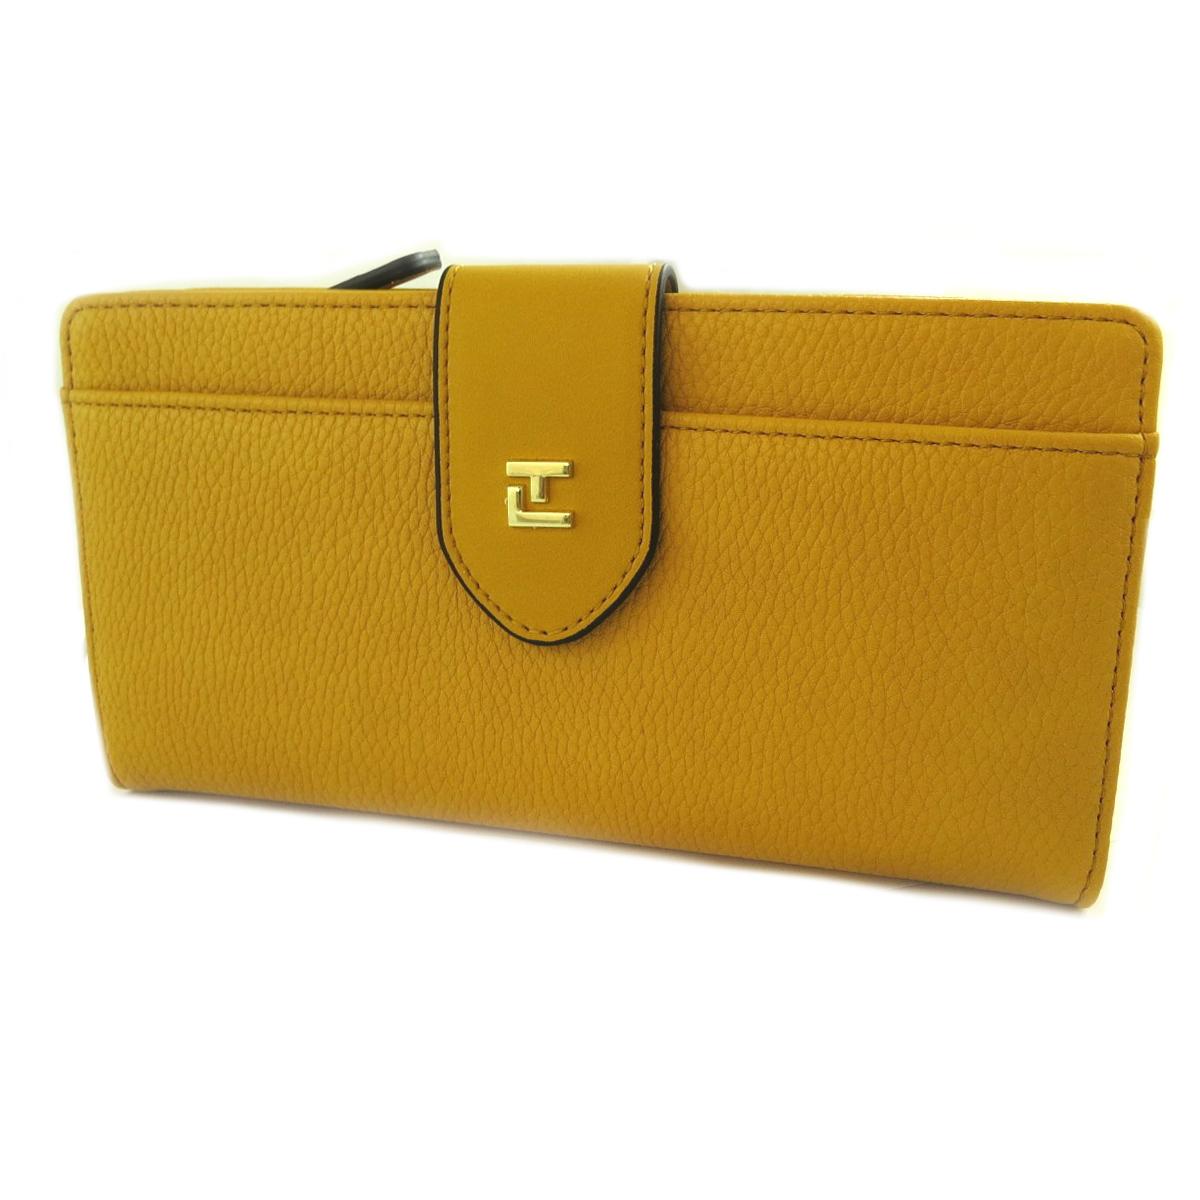 Compagnon \'Ted Lapidus\' jaune moutarde - 205x12x3 cm - [Q2237]